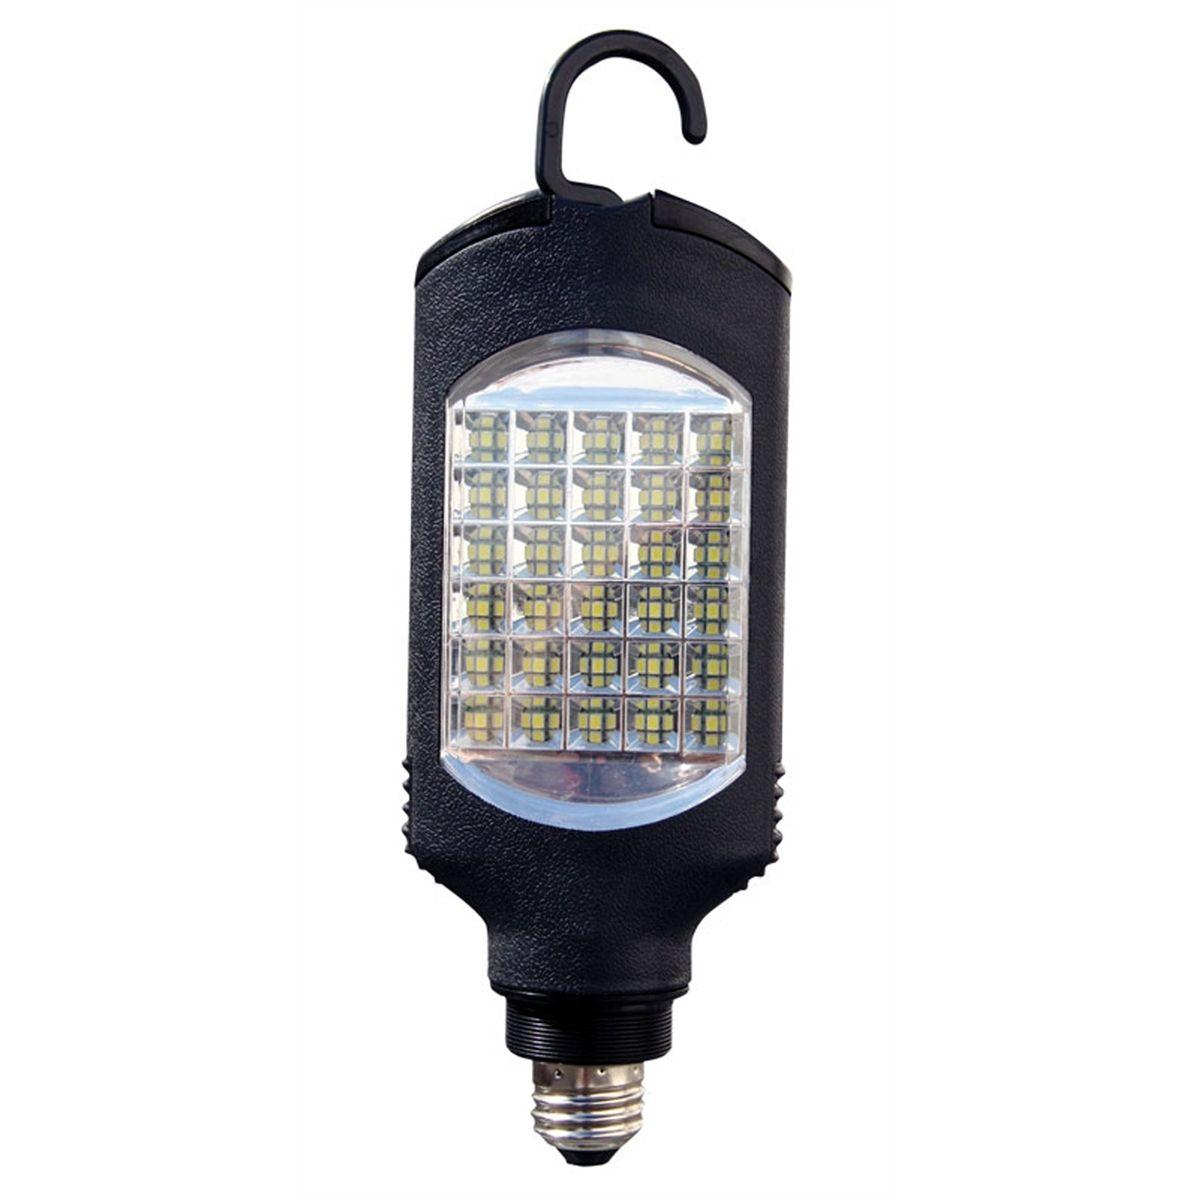 K Tool International 26 Watt Fluorescent Angle Work Light: K Tool International Trouble Light 30 SMD LED Retrofit